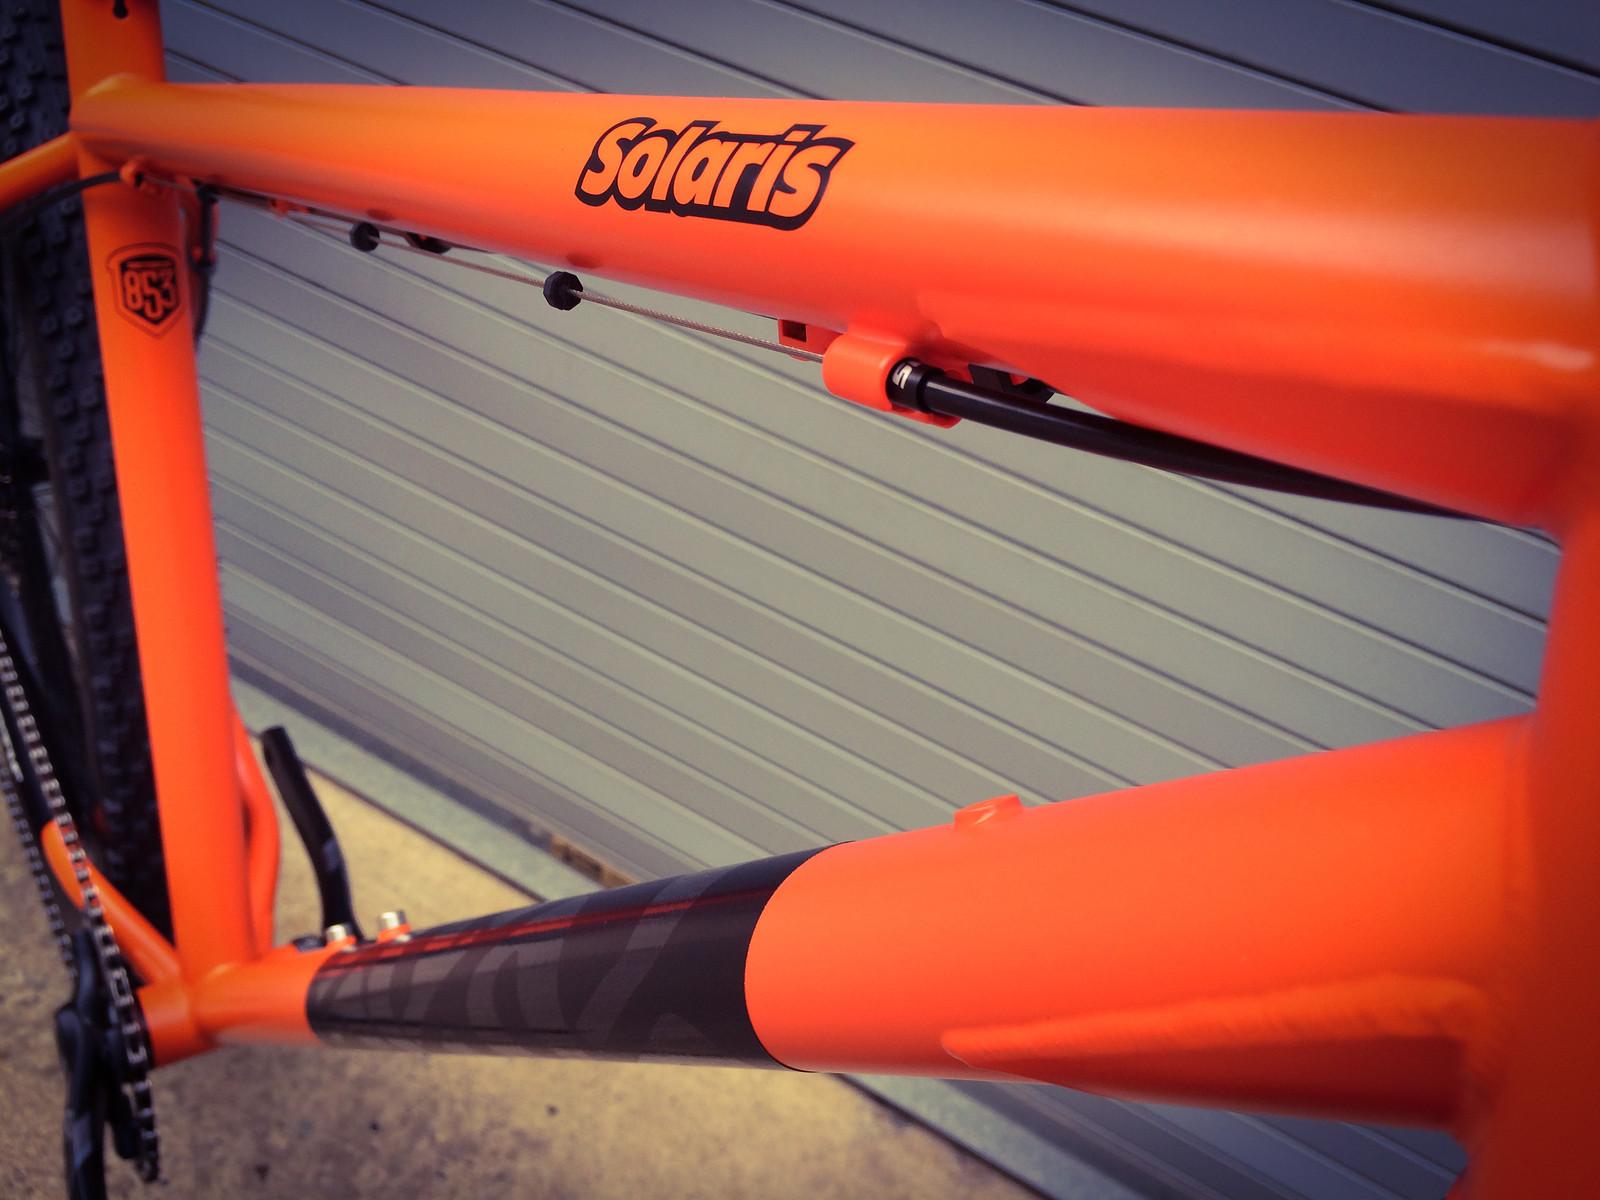 Cotic Solaris - TRAILFLO bikes - Mountain Biking Pictures - Vital MTB